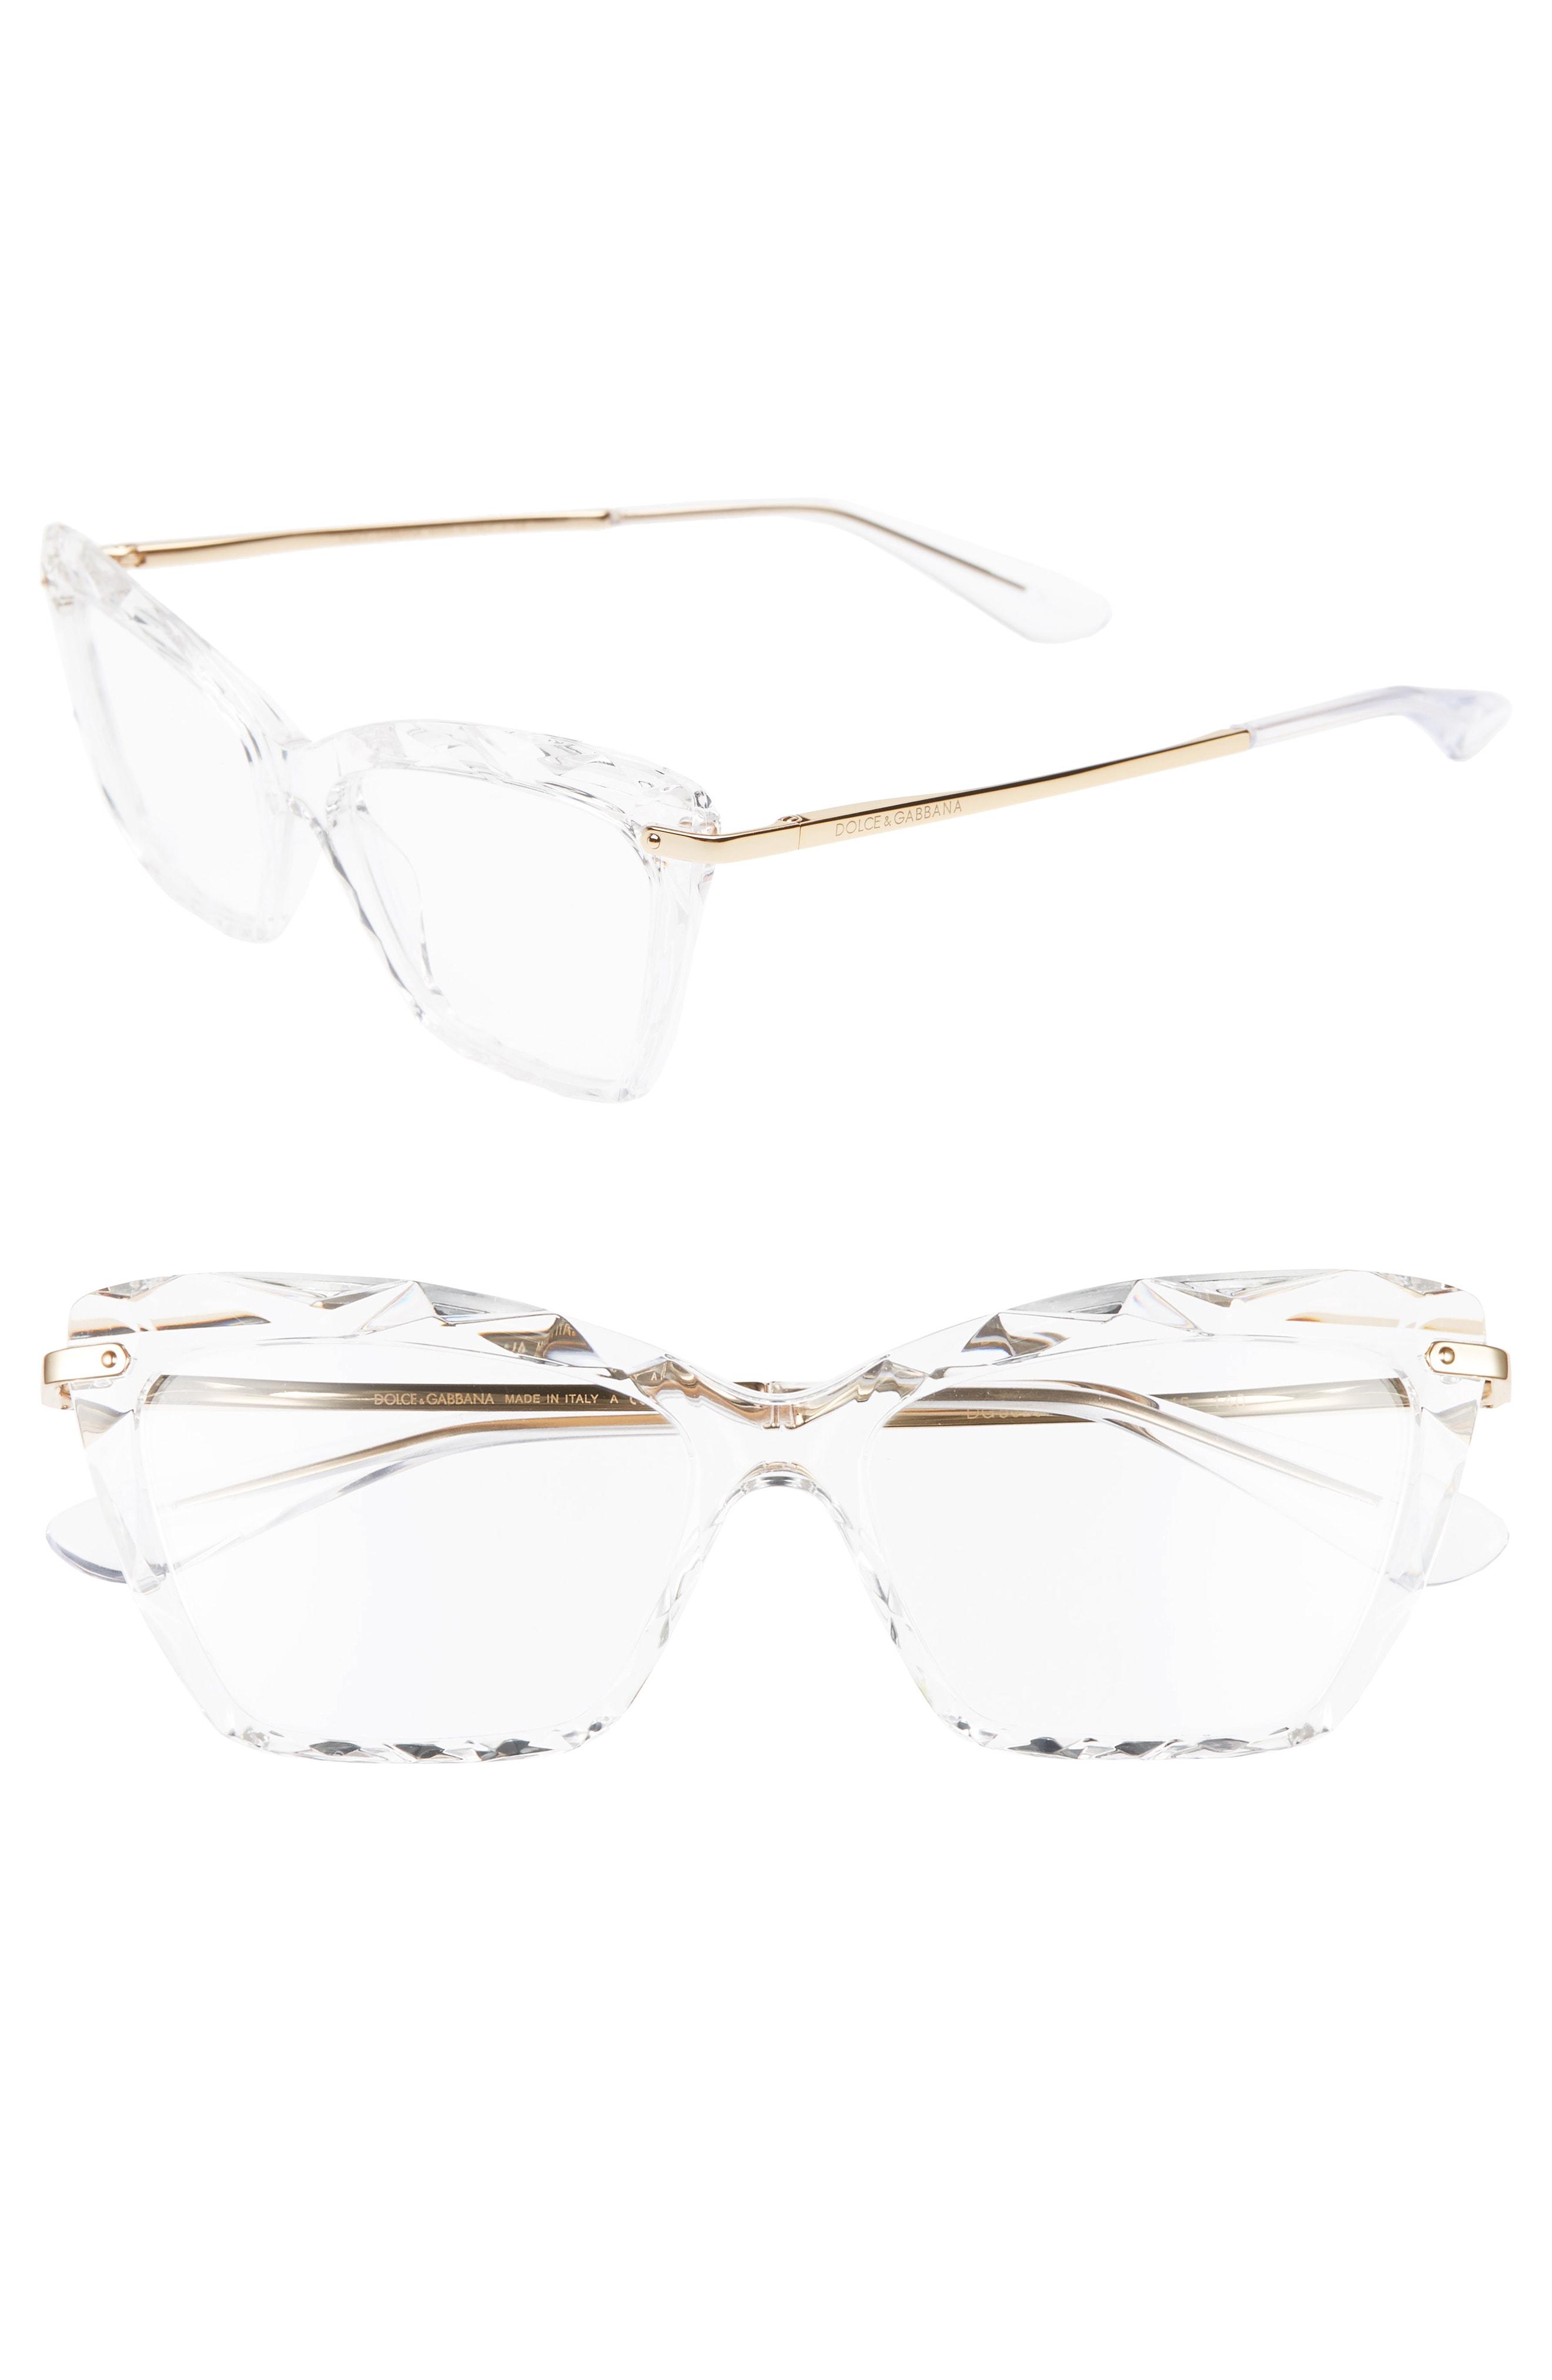 a959a601b3e16 Dolce   Gabbana 53Mm Cat Eye Optical Glasses - Crystal  Gold